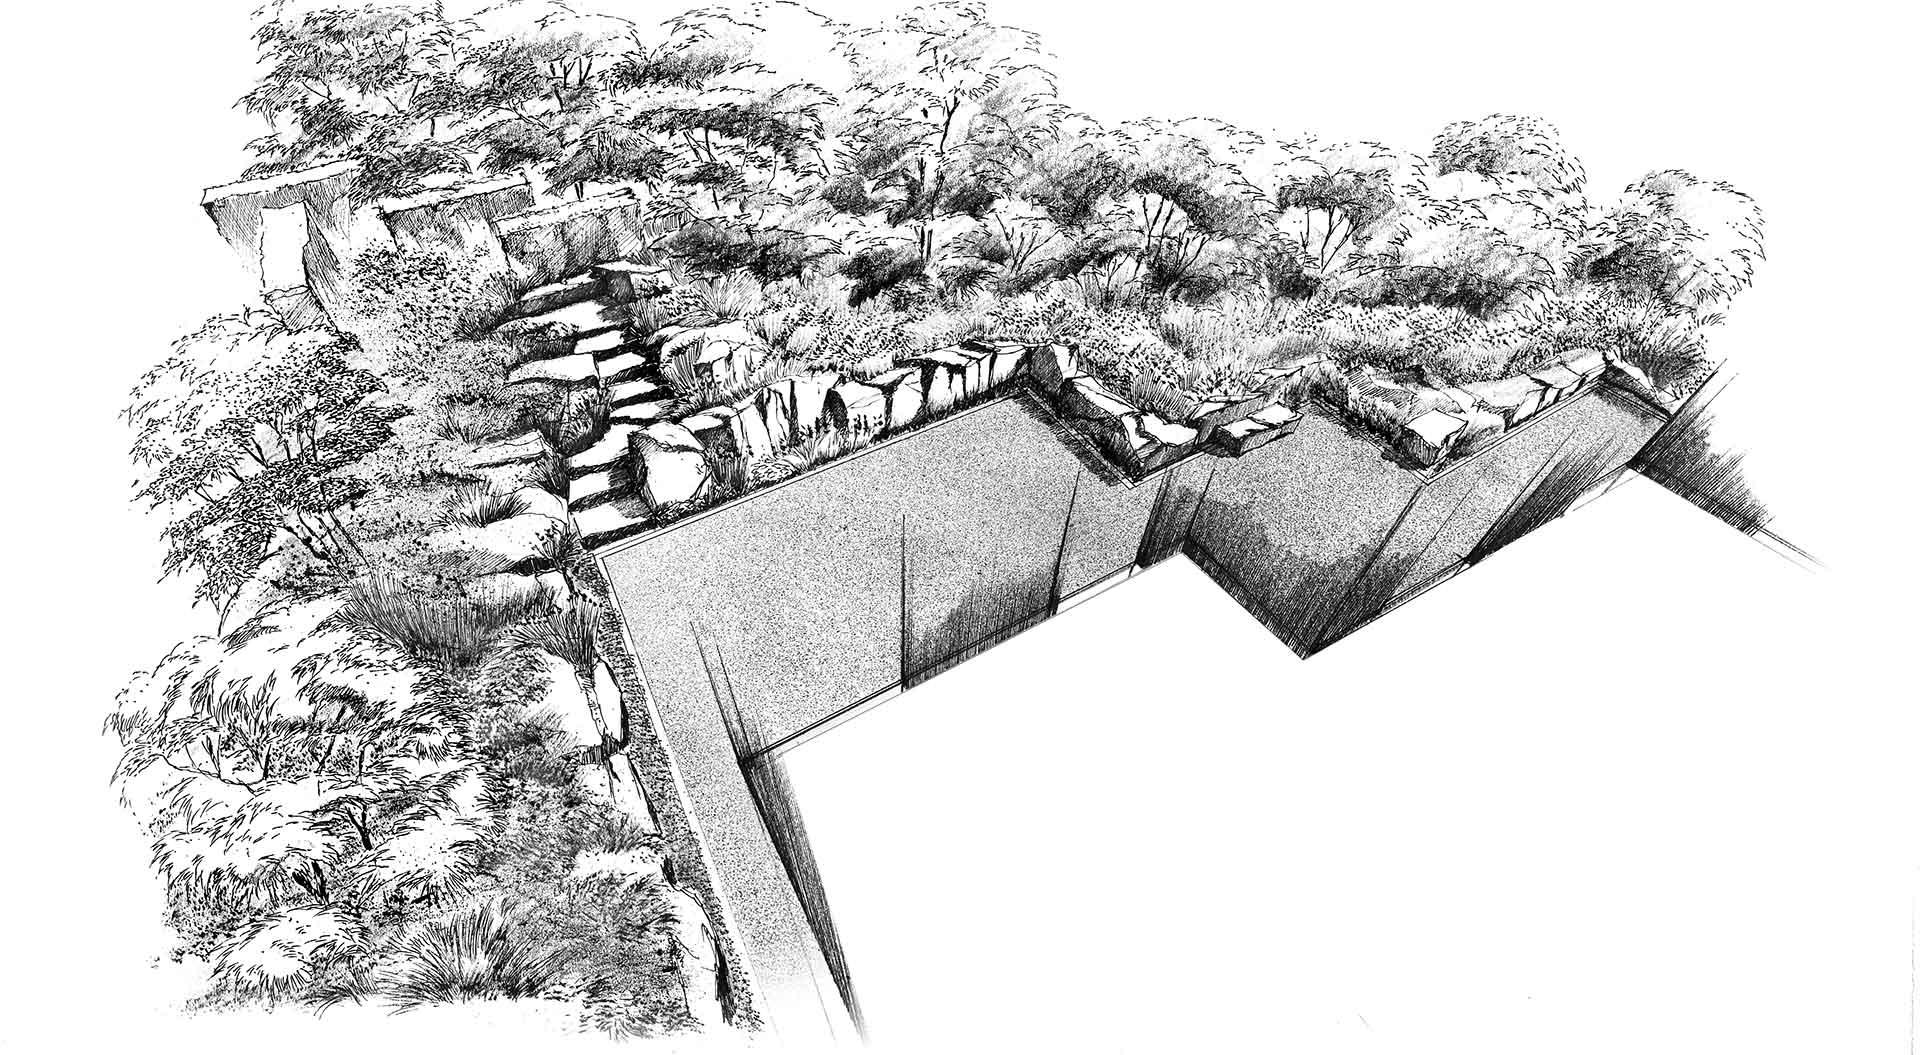 Skizze für Hanggarten-Planung im Ahrtal